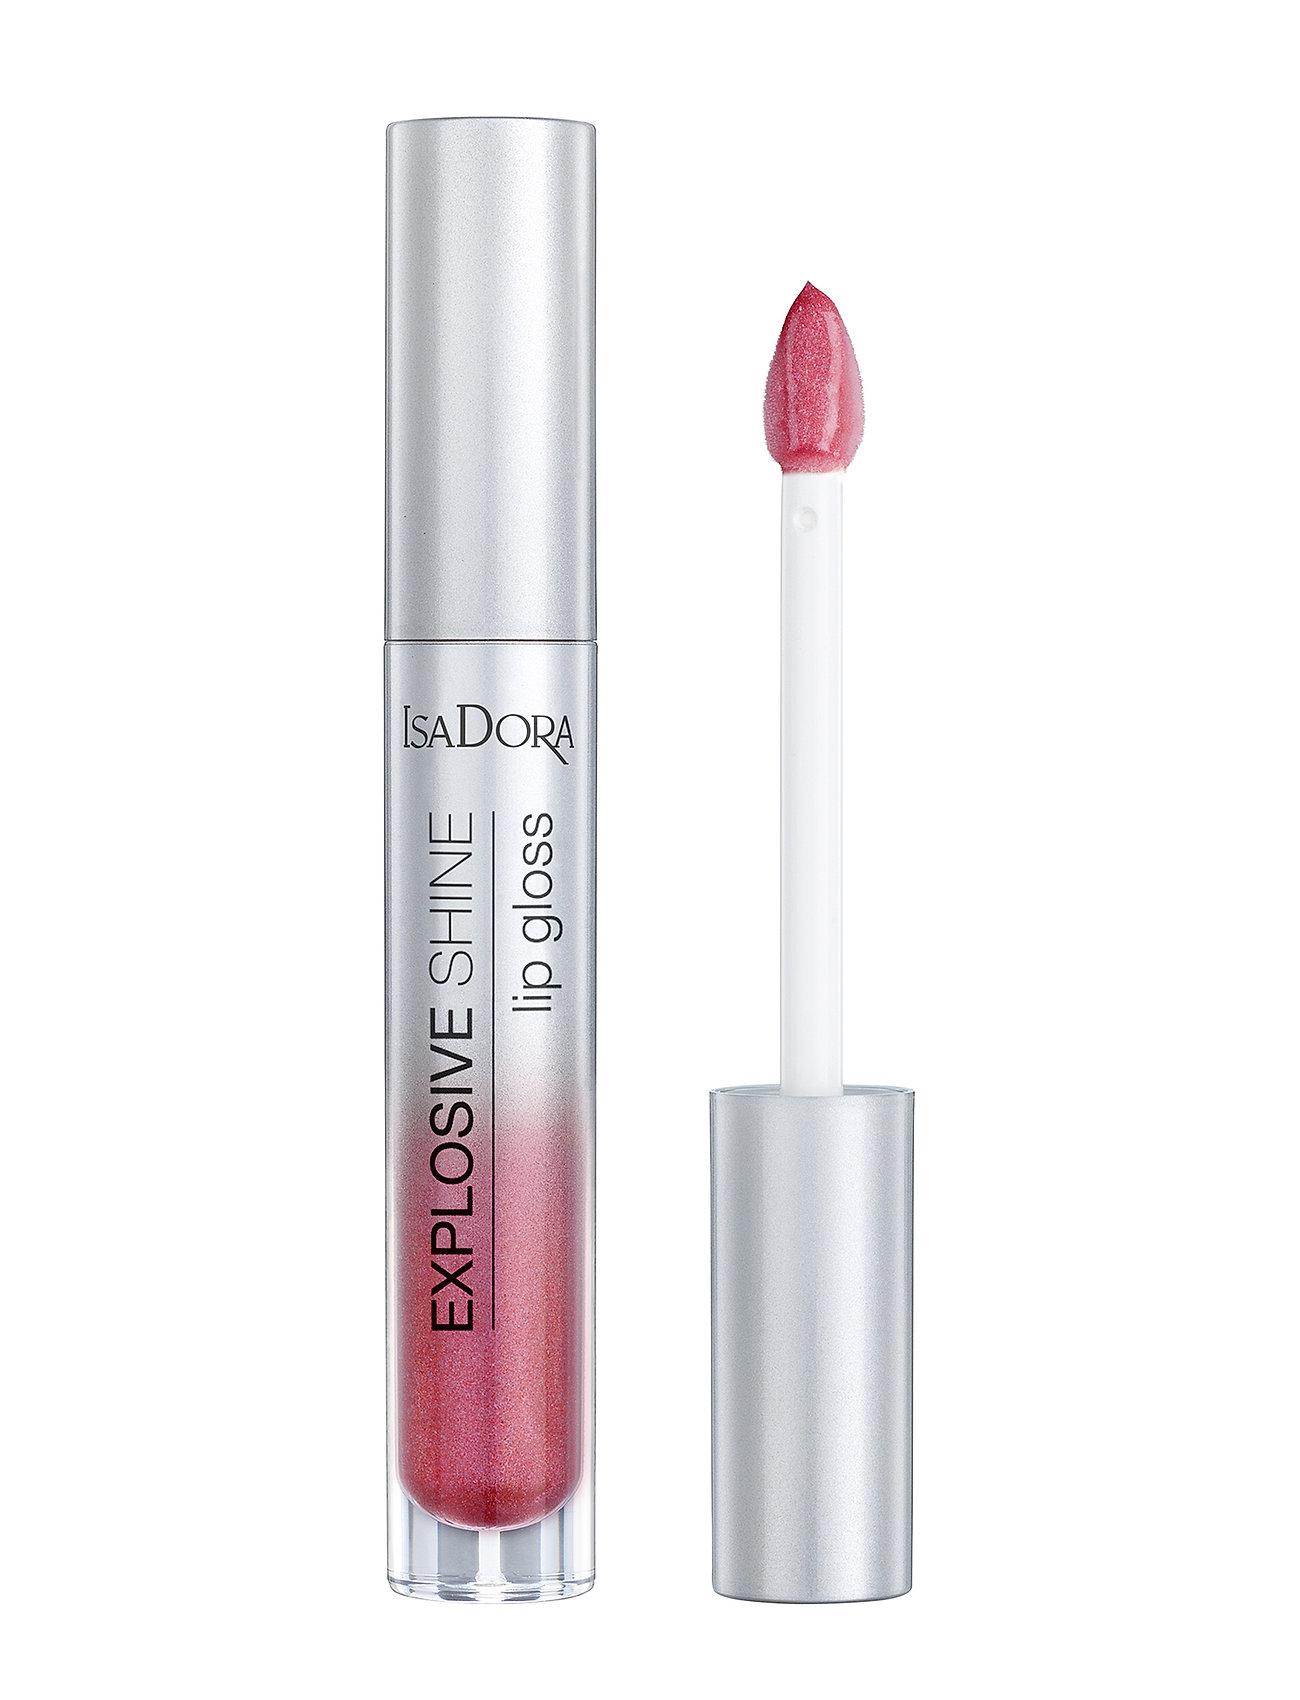 Isadora - Explosive Shine Lip Gloss - läppglans - frozen raspberry - 1